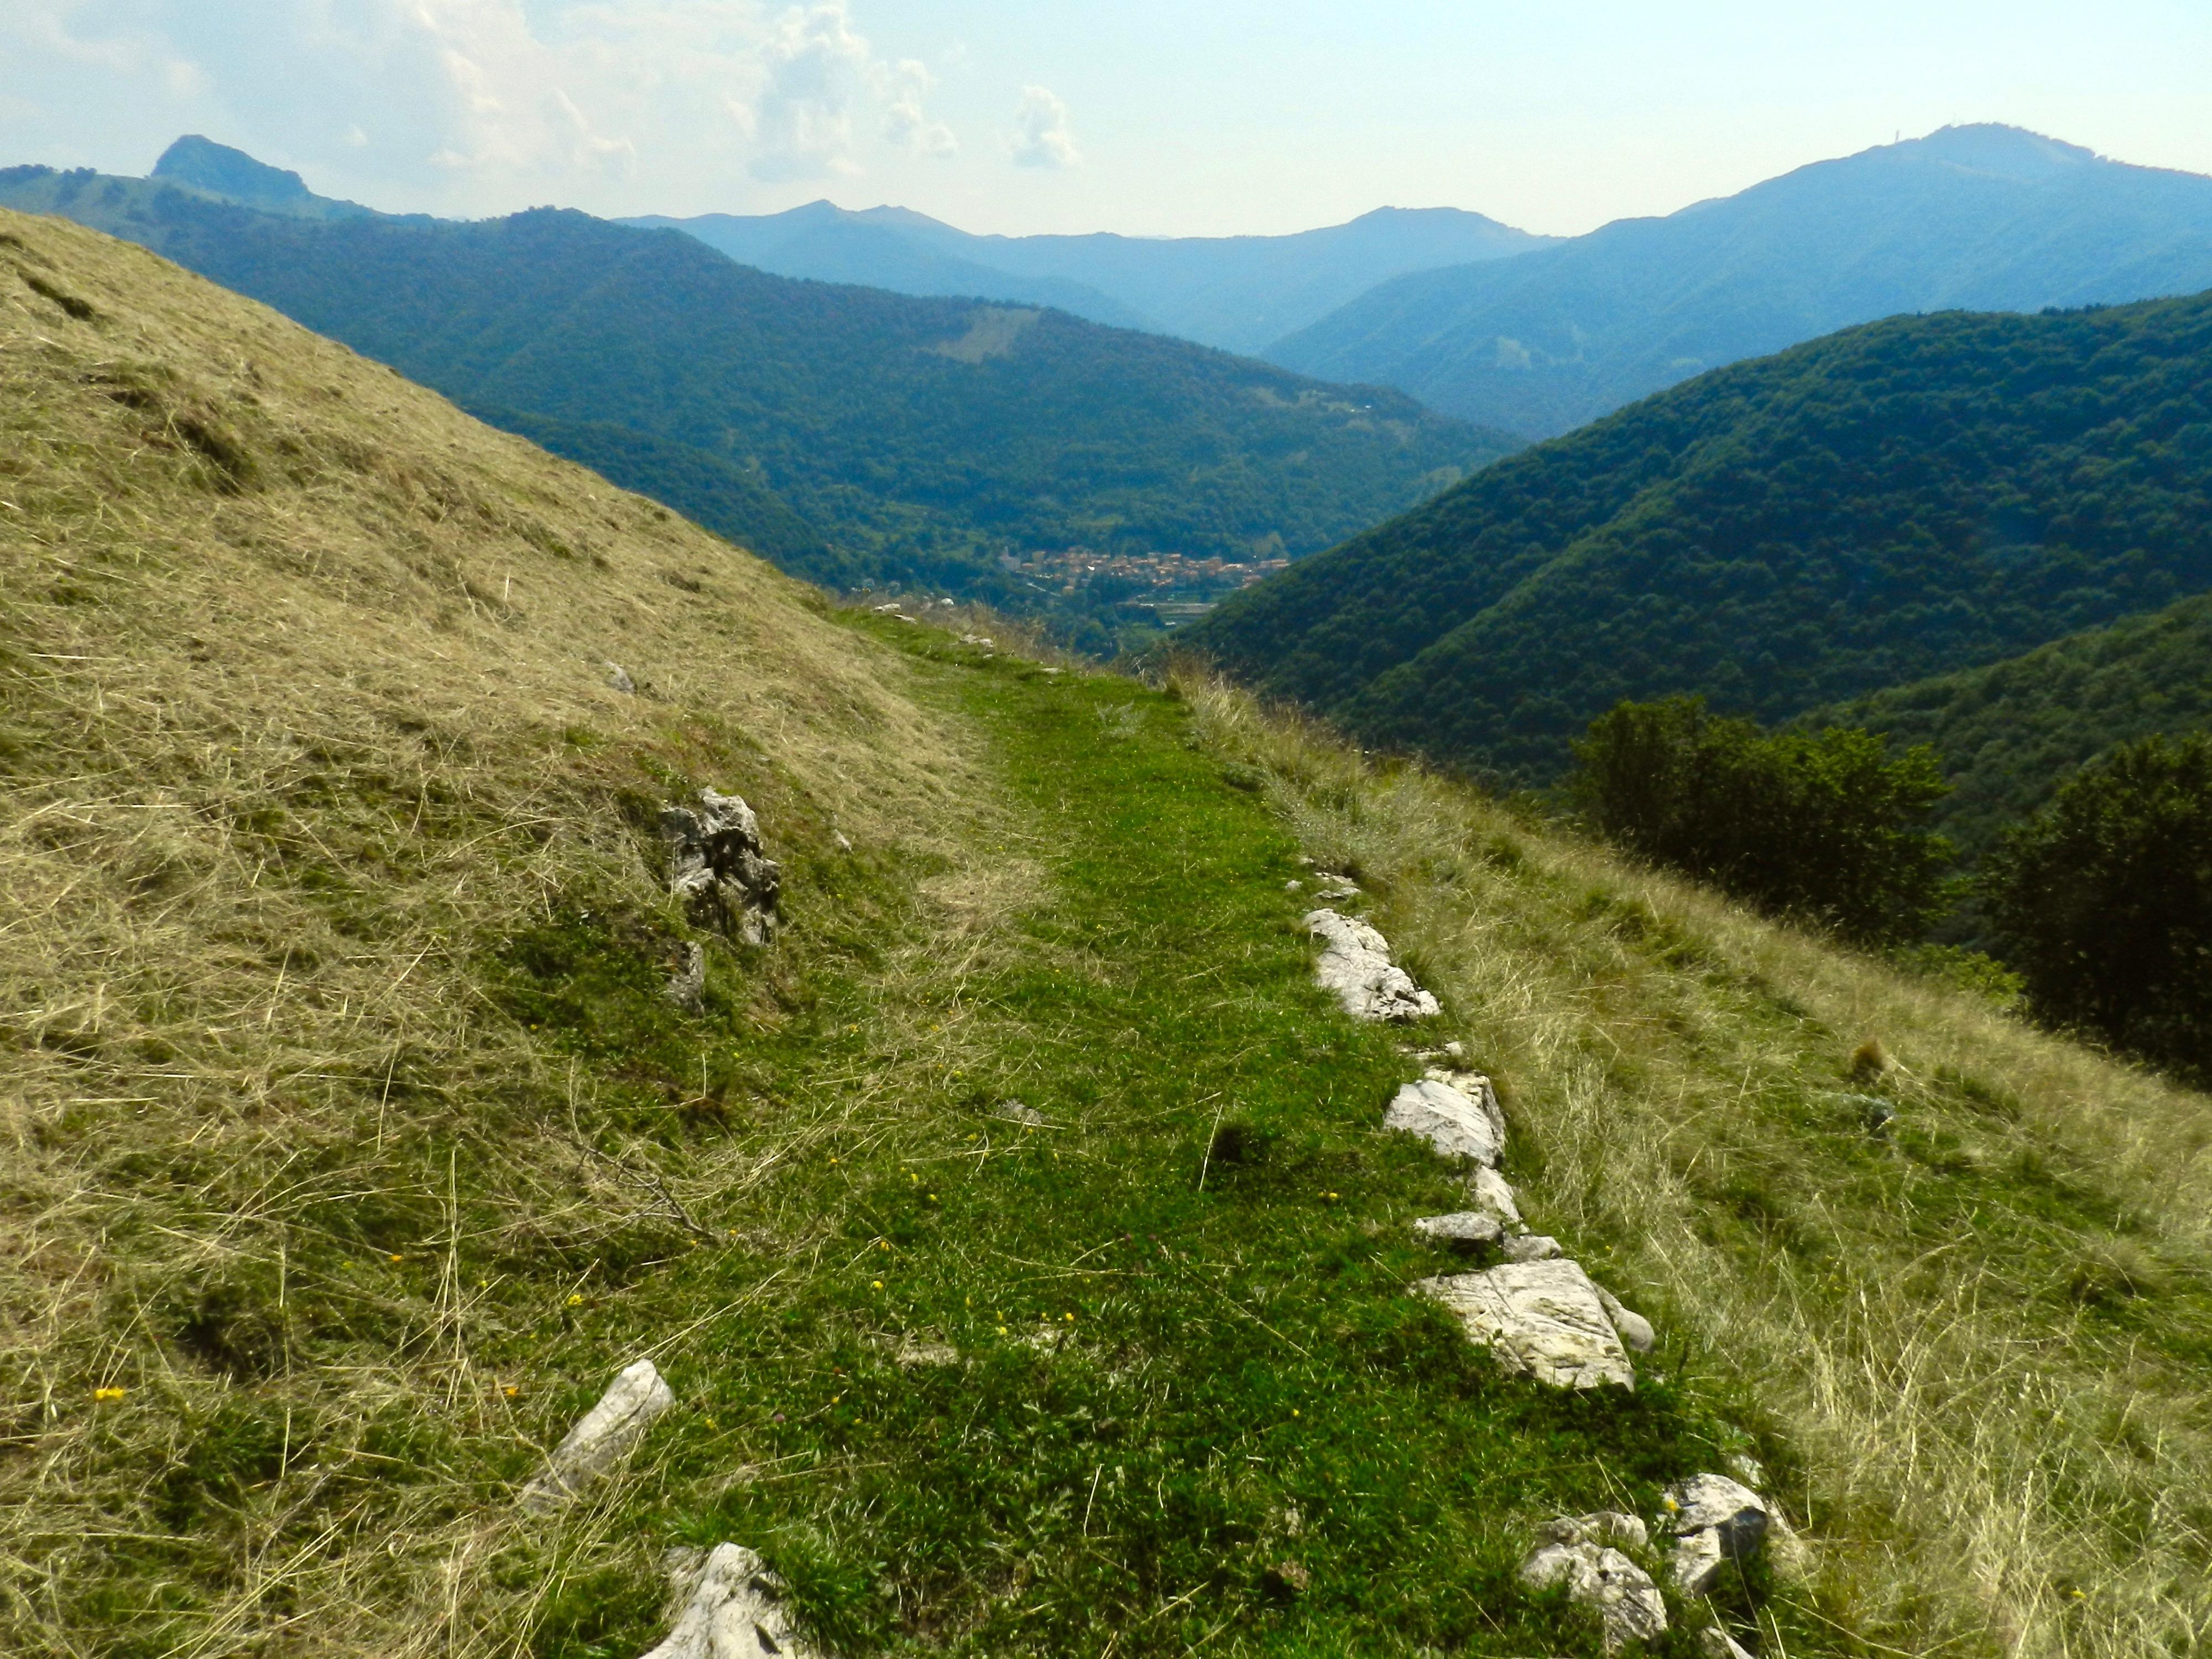 Sentiero Pianspessa, Valle di Muggio